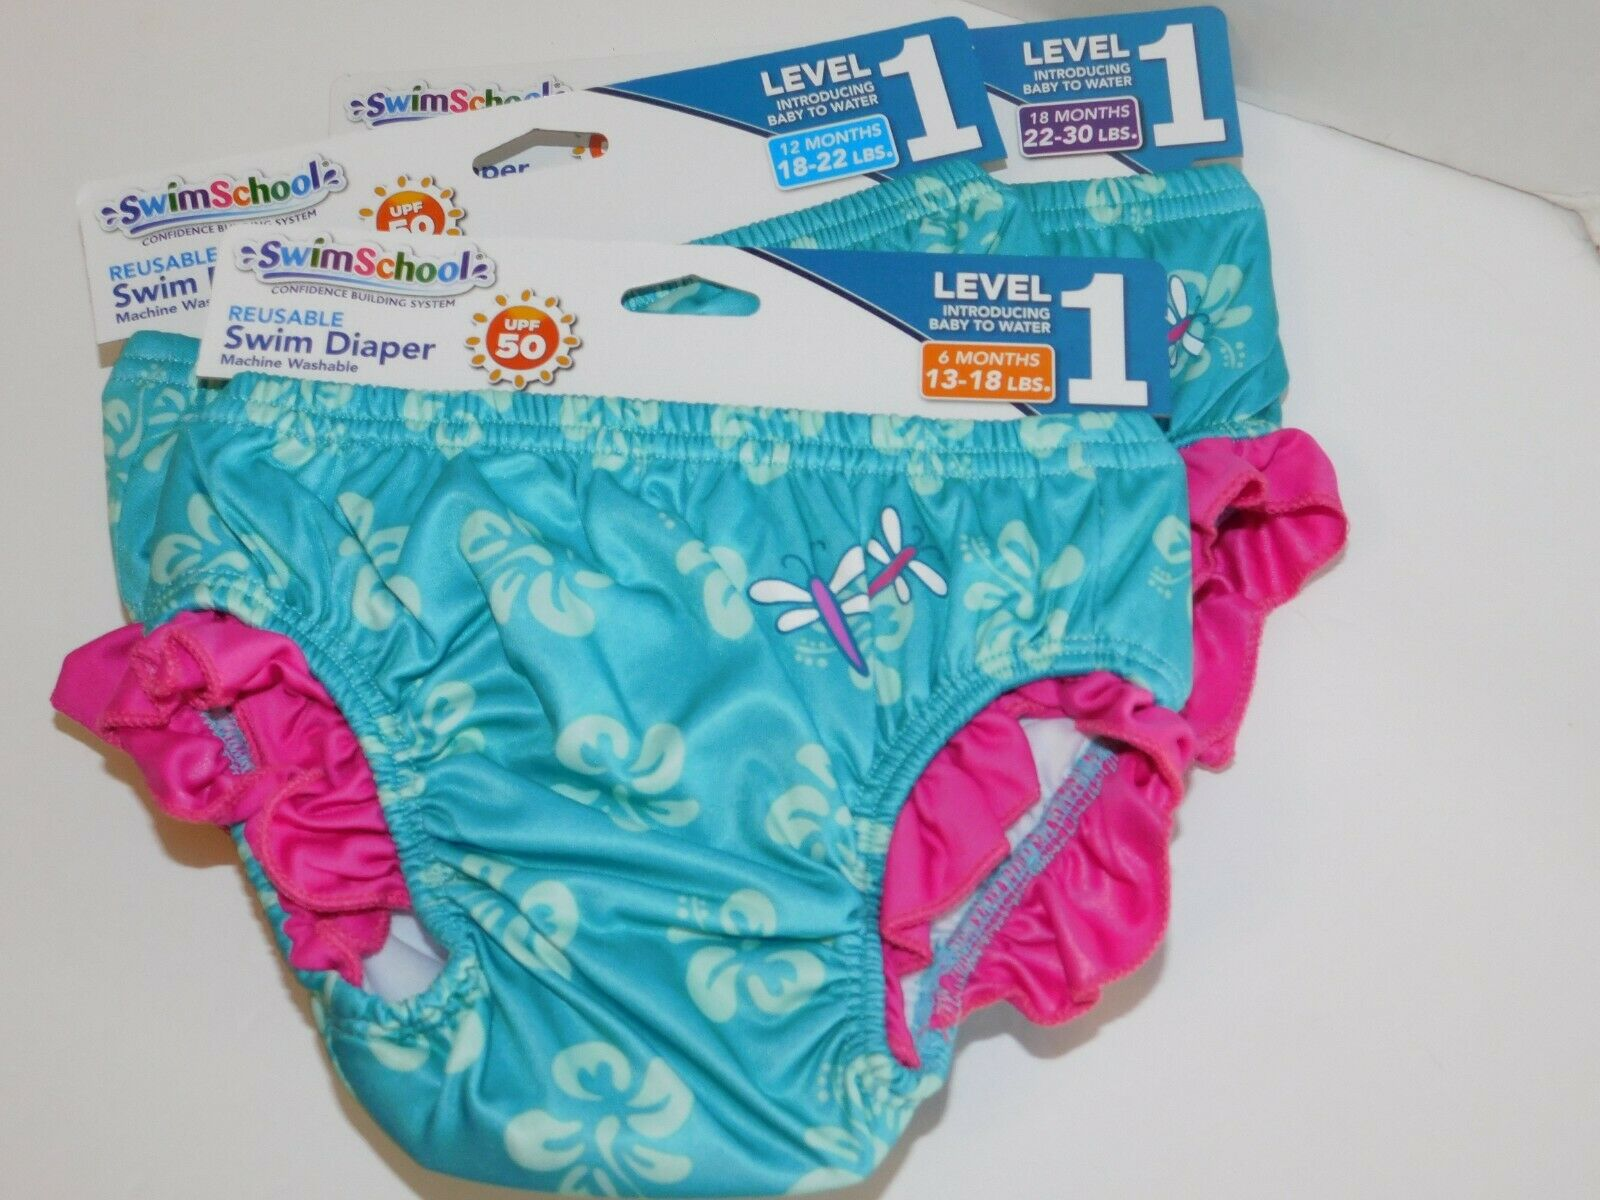 Swim School Reusable UPF 50 Girls Swim Diaper Training Pants 12 mo